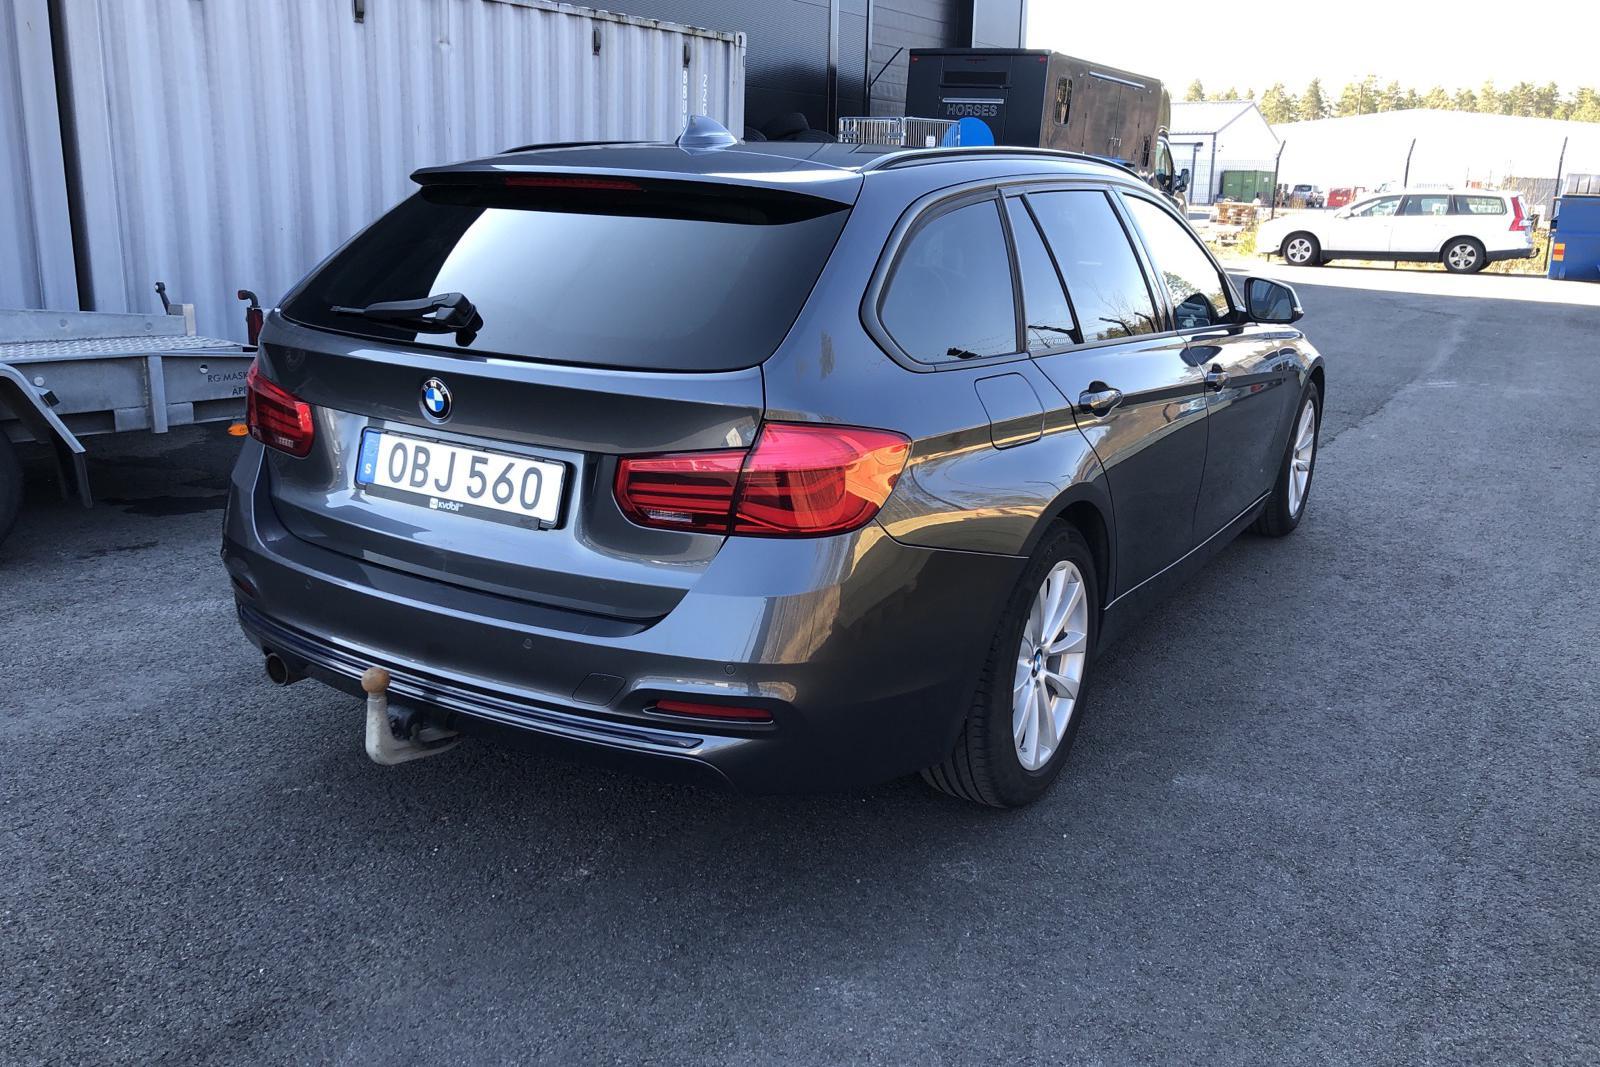 BMW 318d Touring, F31 (150hk) - 119 250 km - Automatic - gray - 2016